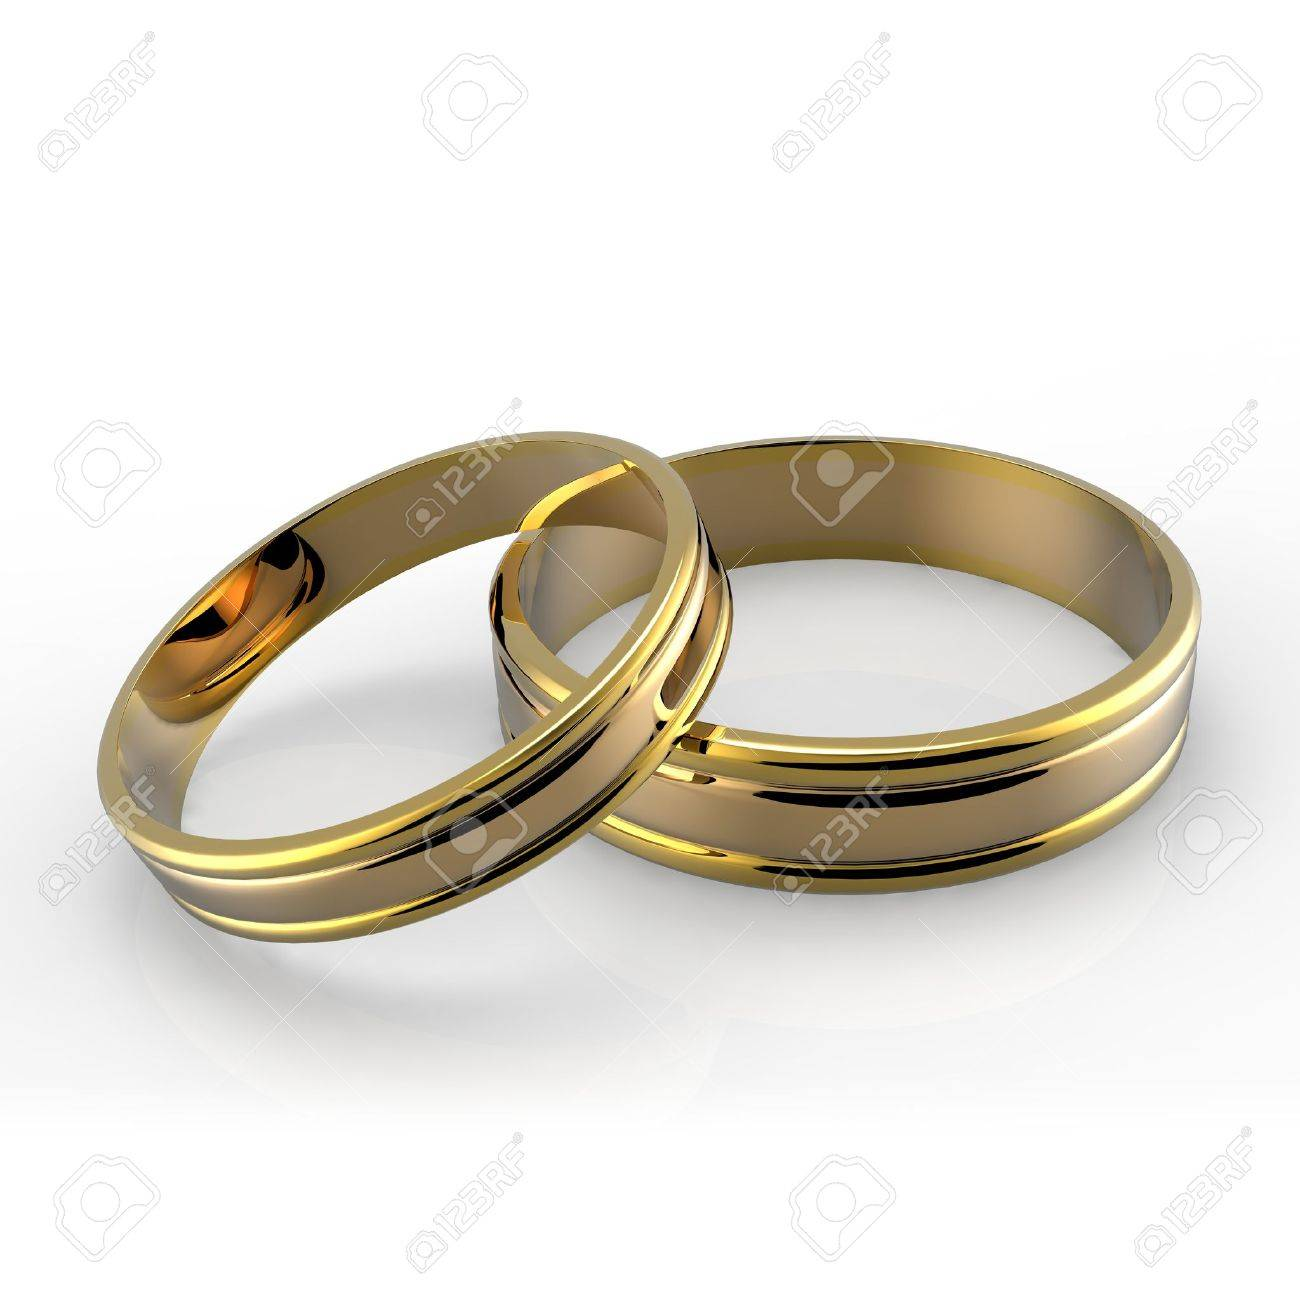 Bienvenidos al nuevo foro de apoyo a Noe #242 / 06.04.15 ~ 10.04.15 - Página 5 13427773-Closeup-of-Gold-wedding-bands-on-white-background--Stock-Photo-wedding-rings-ring